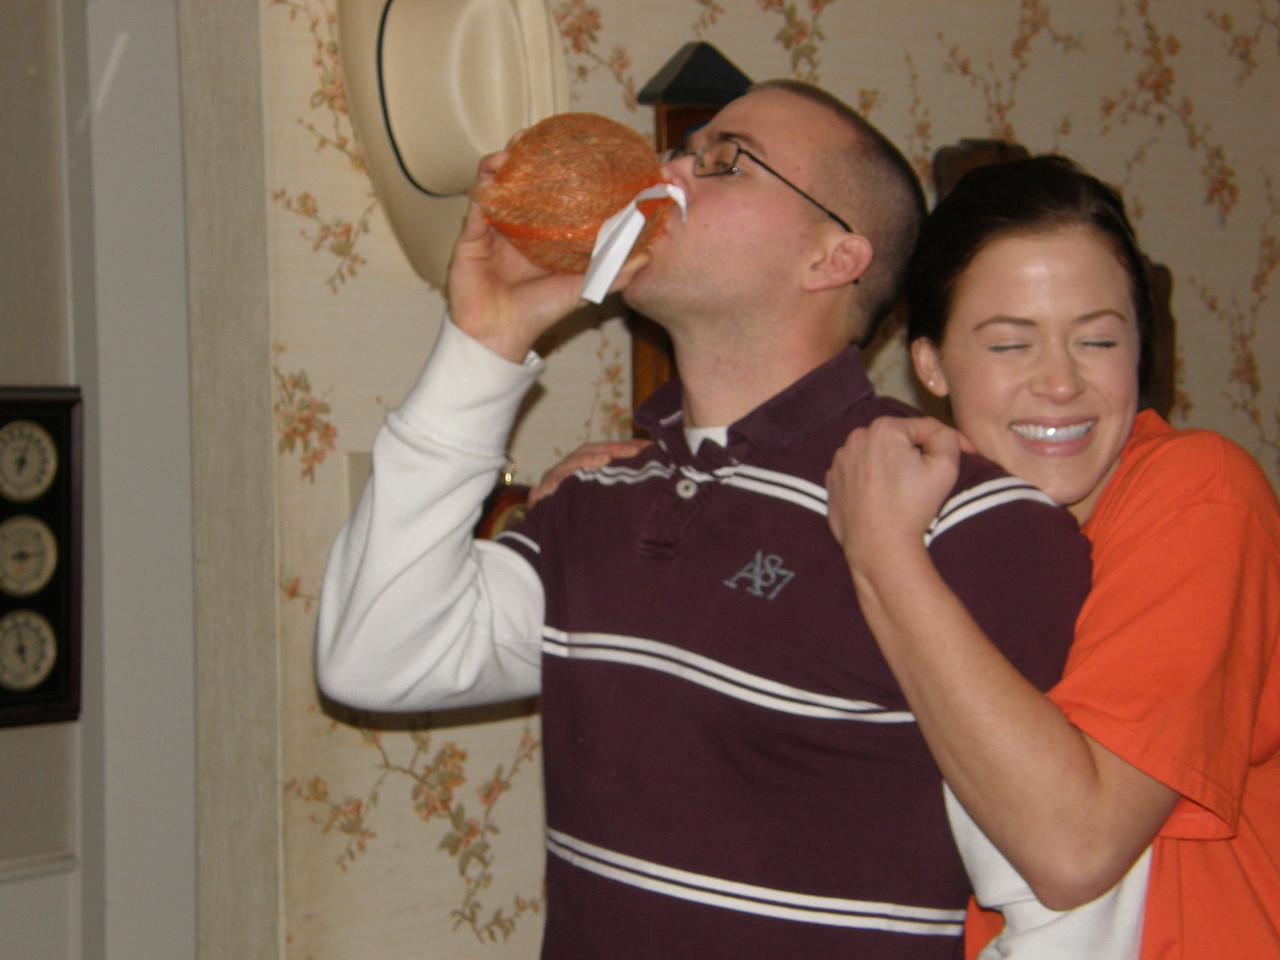 Luke drinking coconut milk and Sarah hugging her bubba.